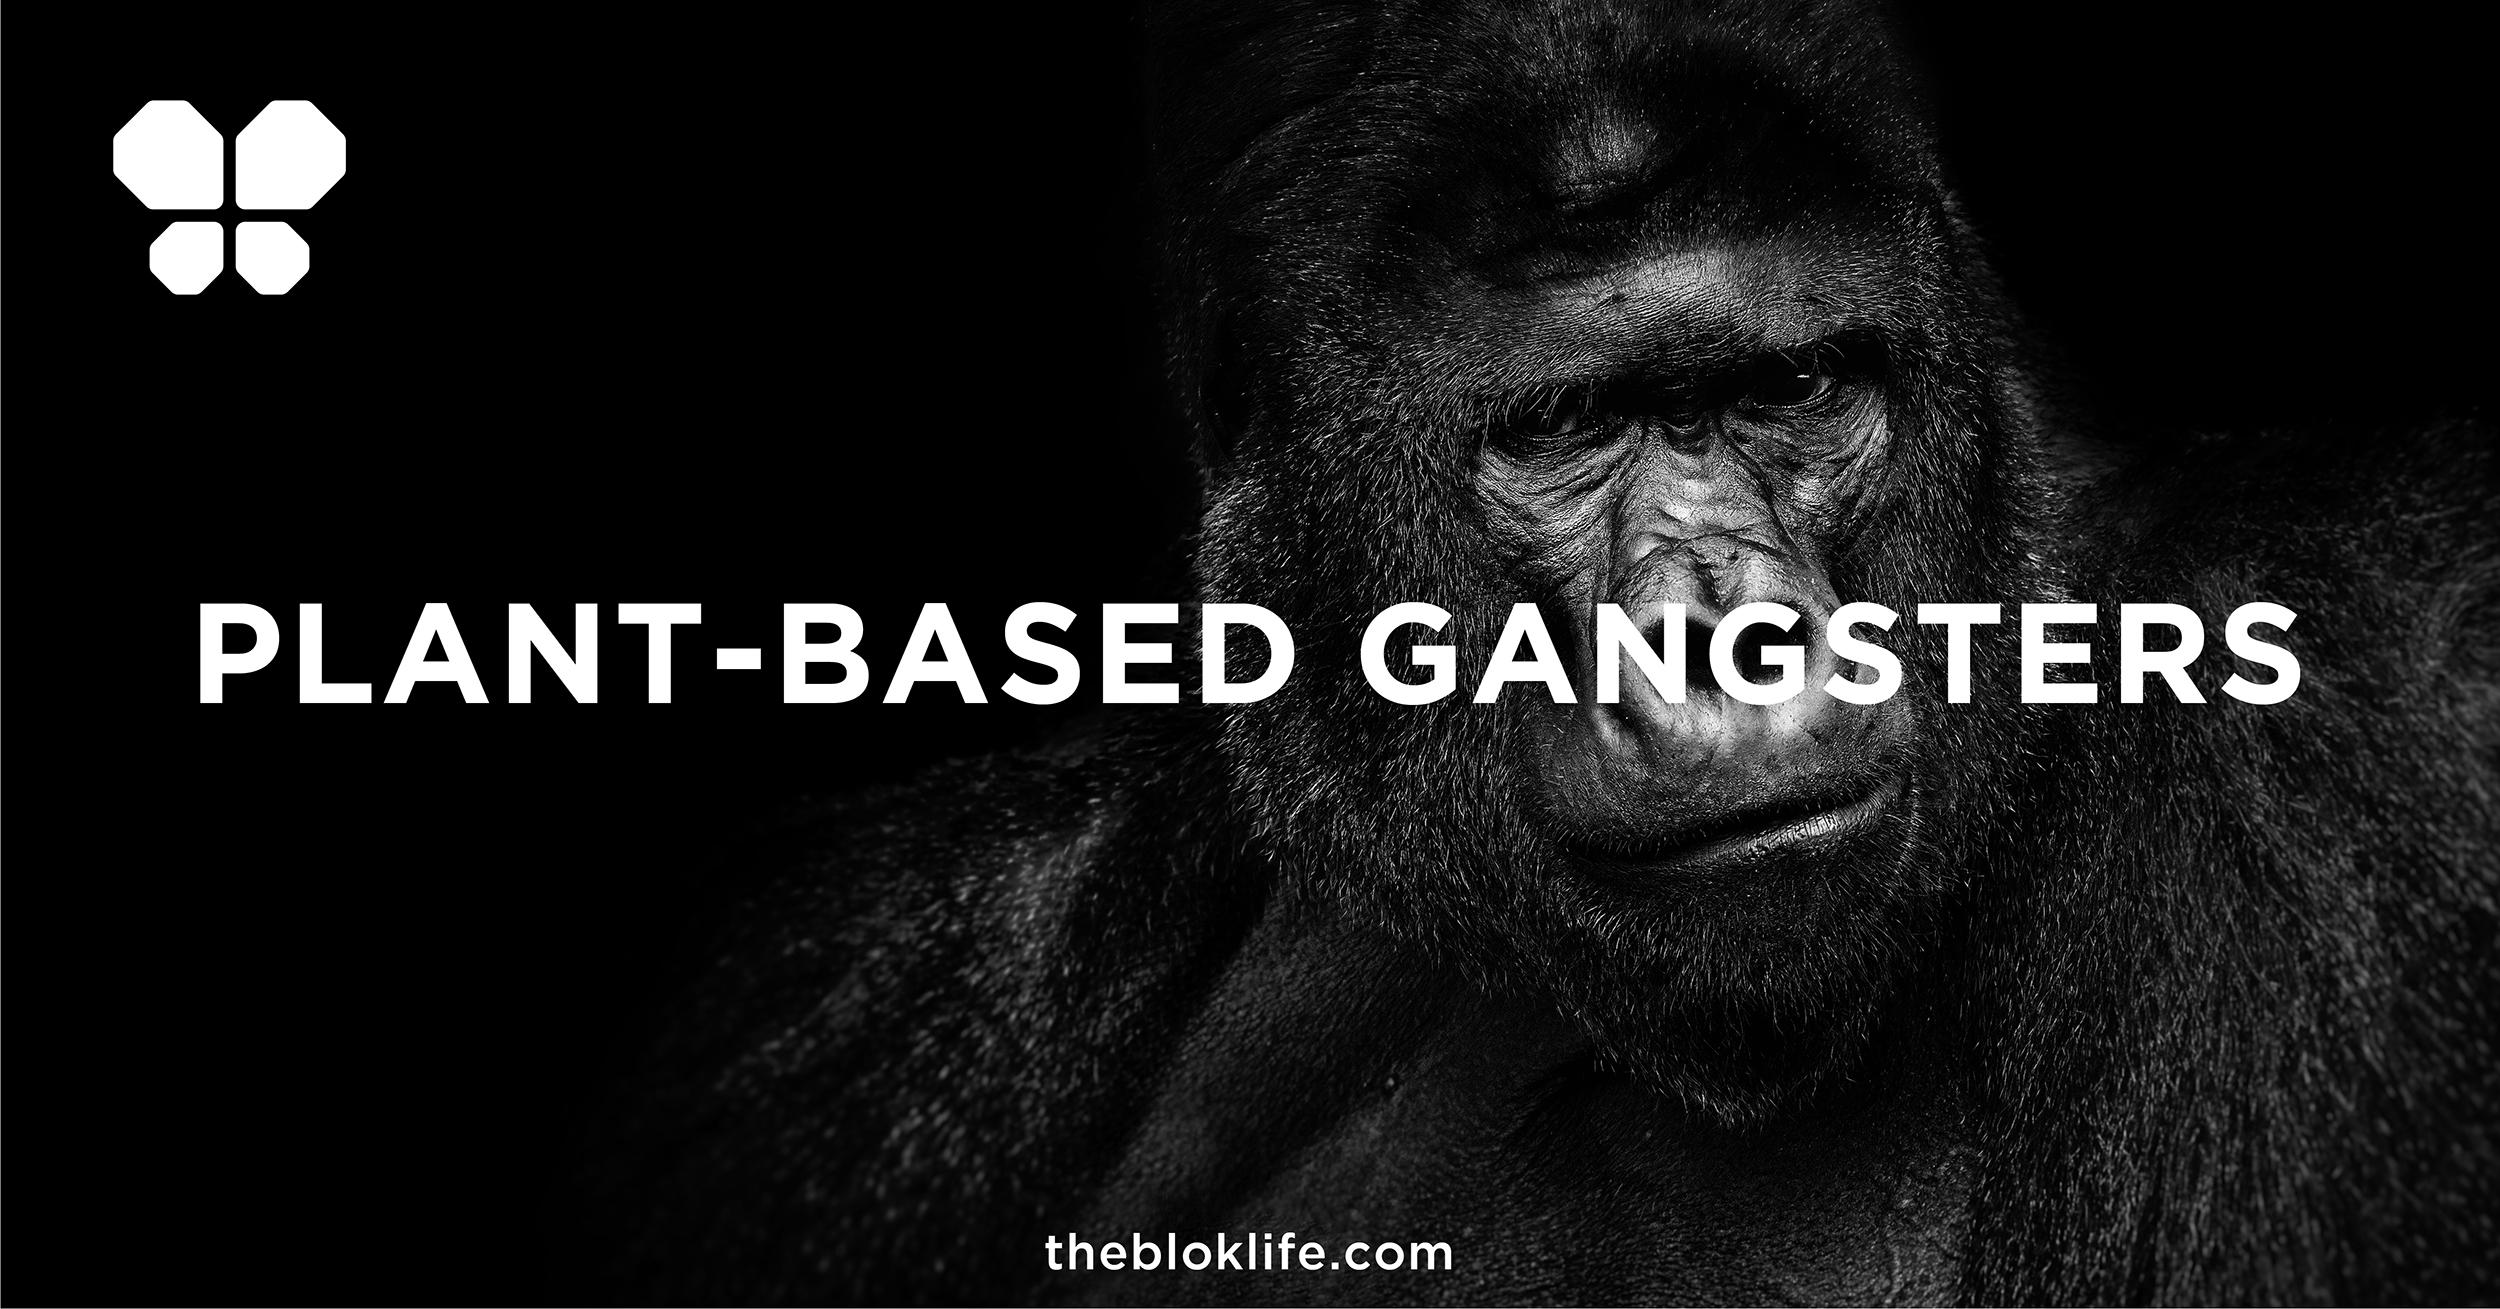 plant-based-gangsters-header-image-blok.jpg